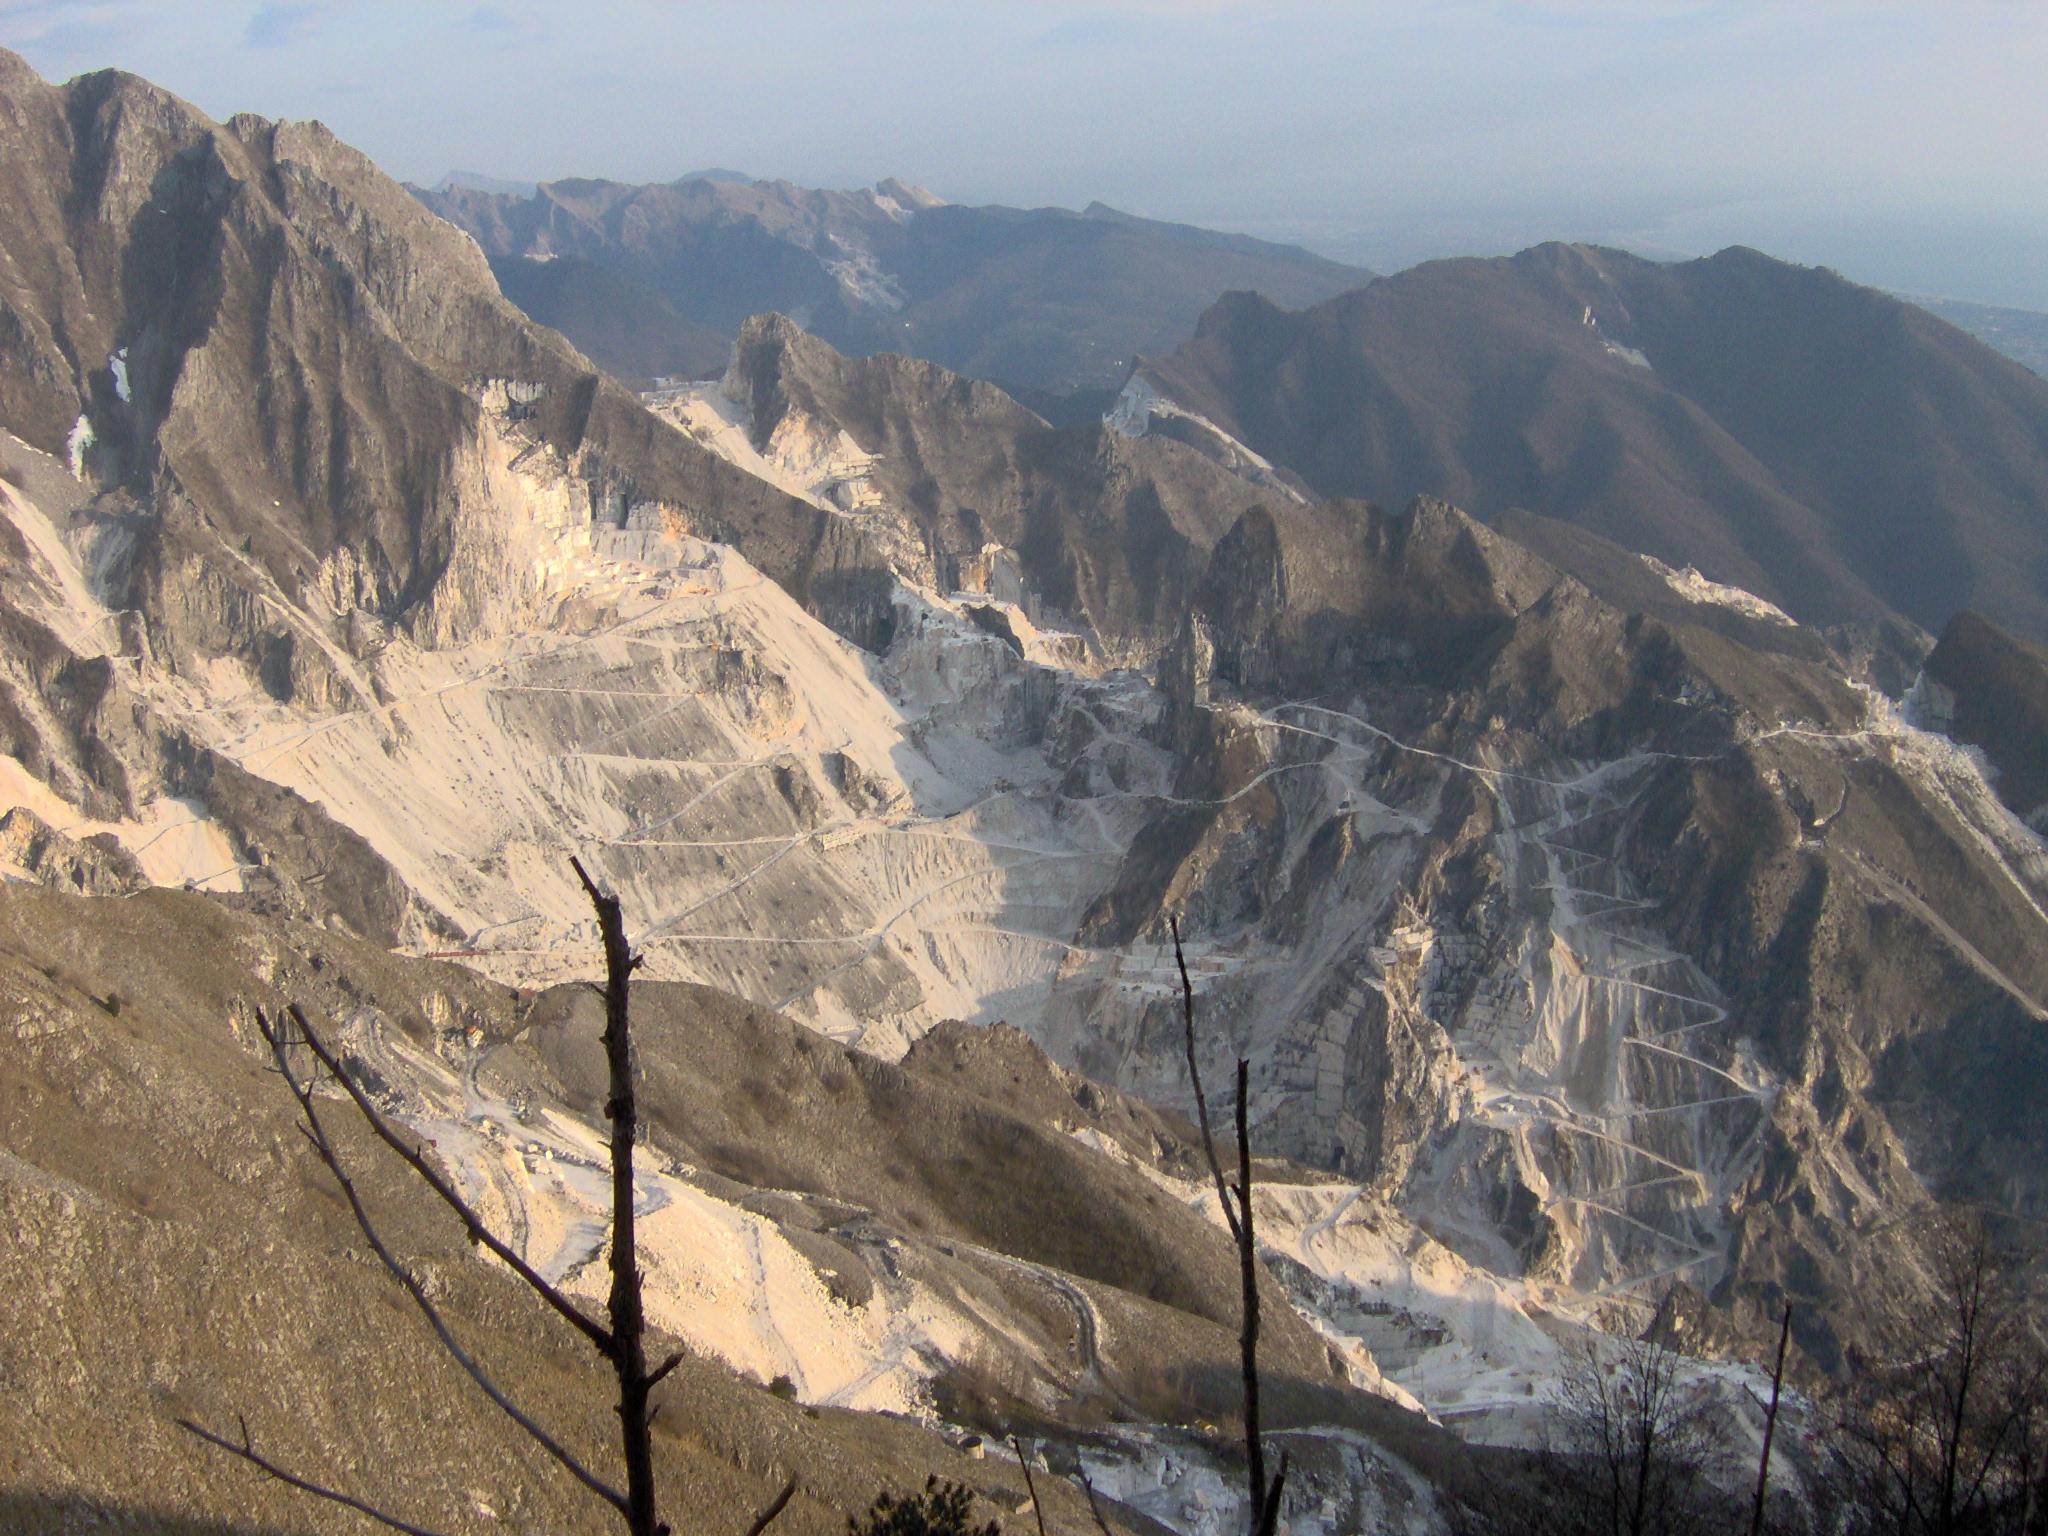 Carrara_-_Cave_di_marmo